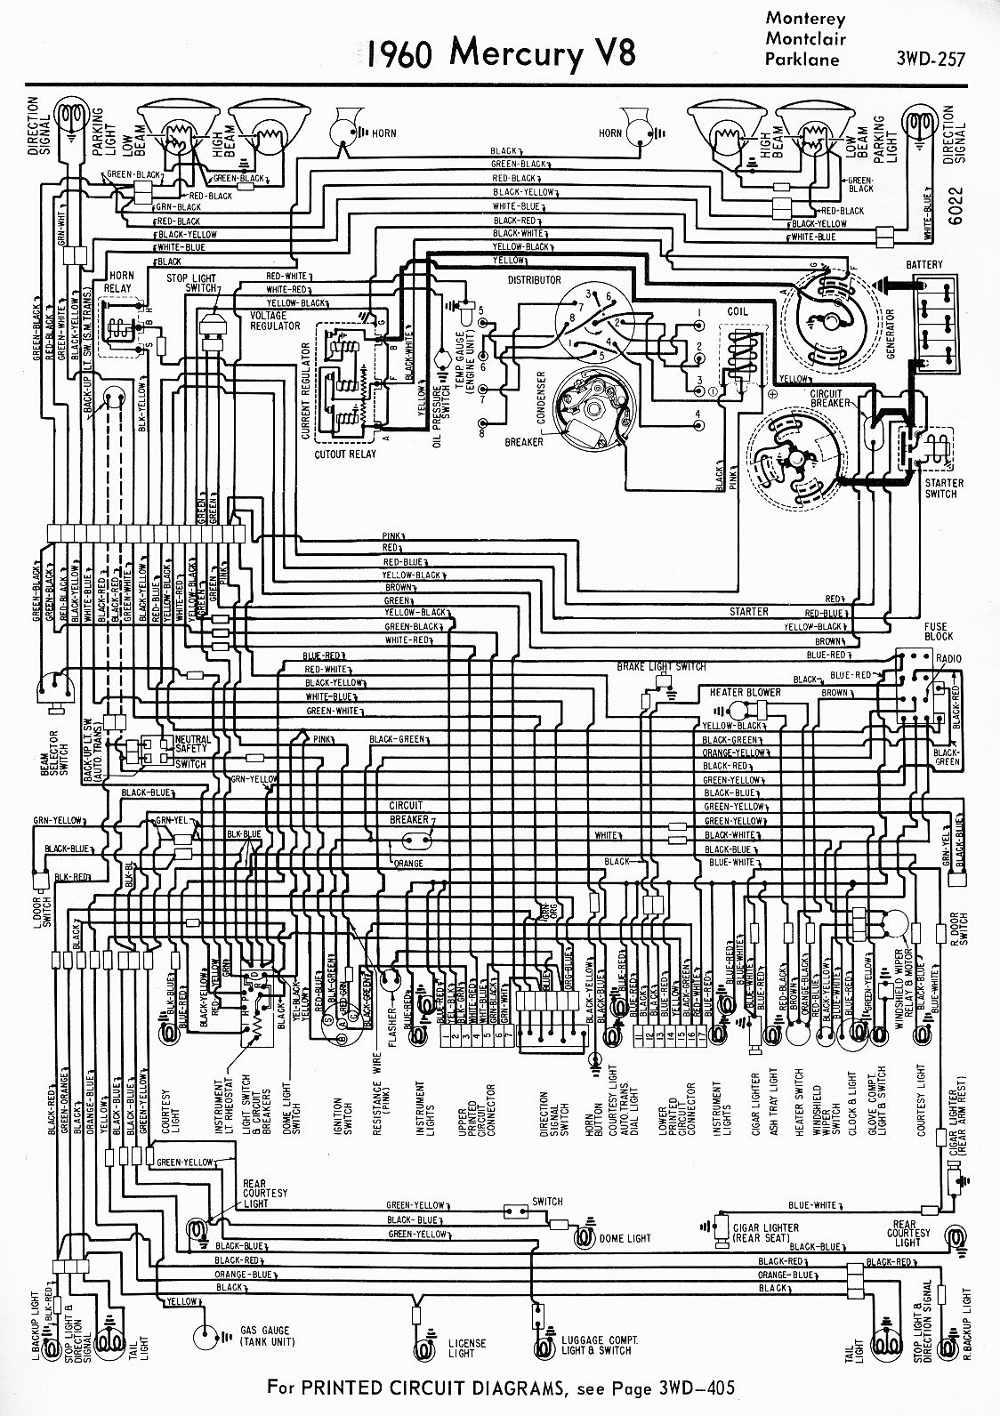 1963 mercury comet wiring diagram